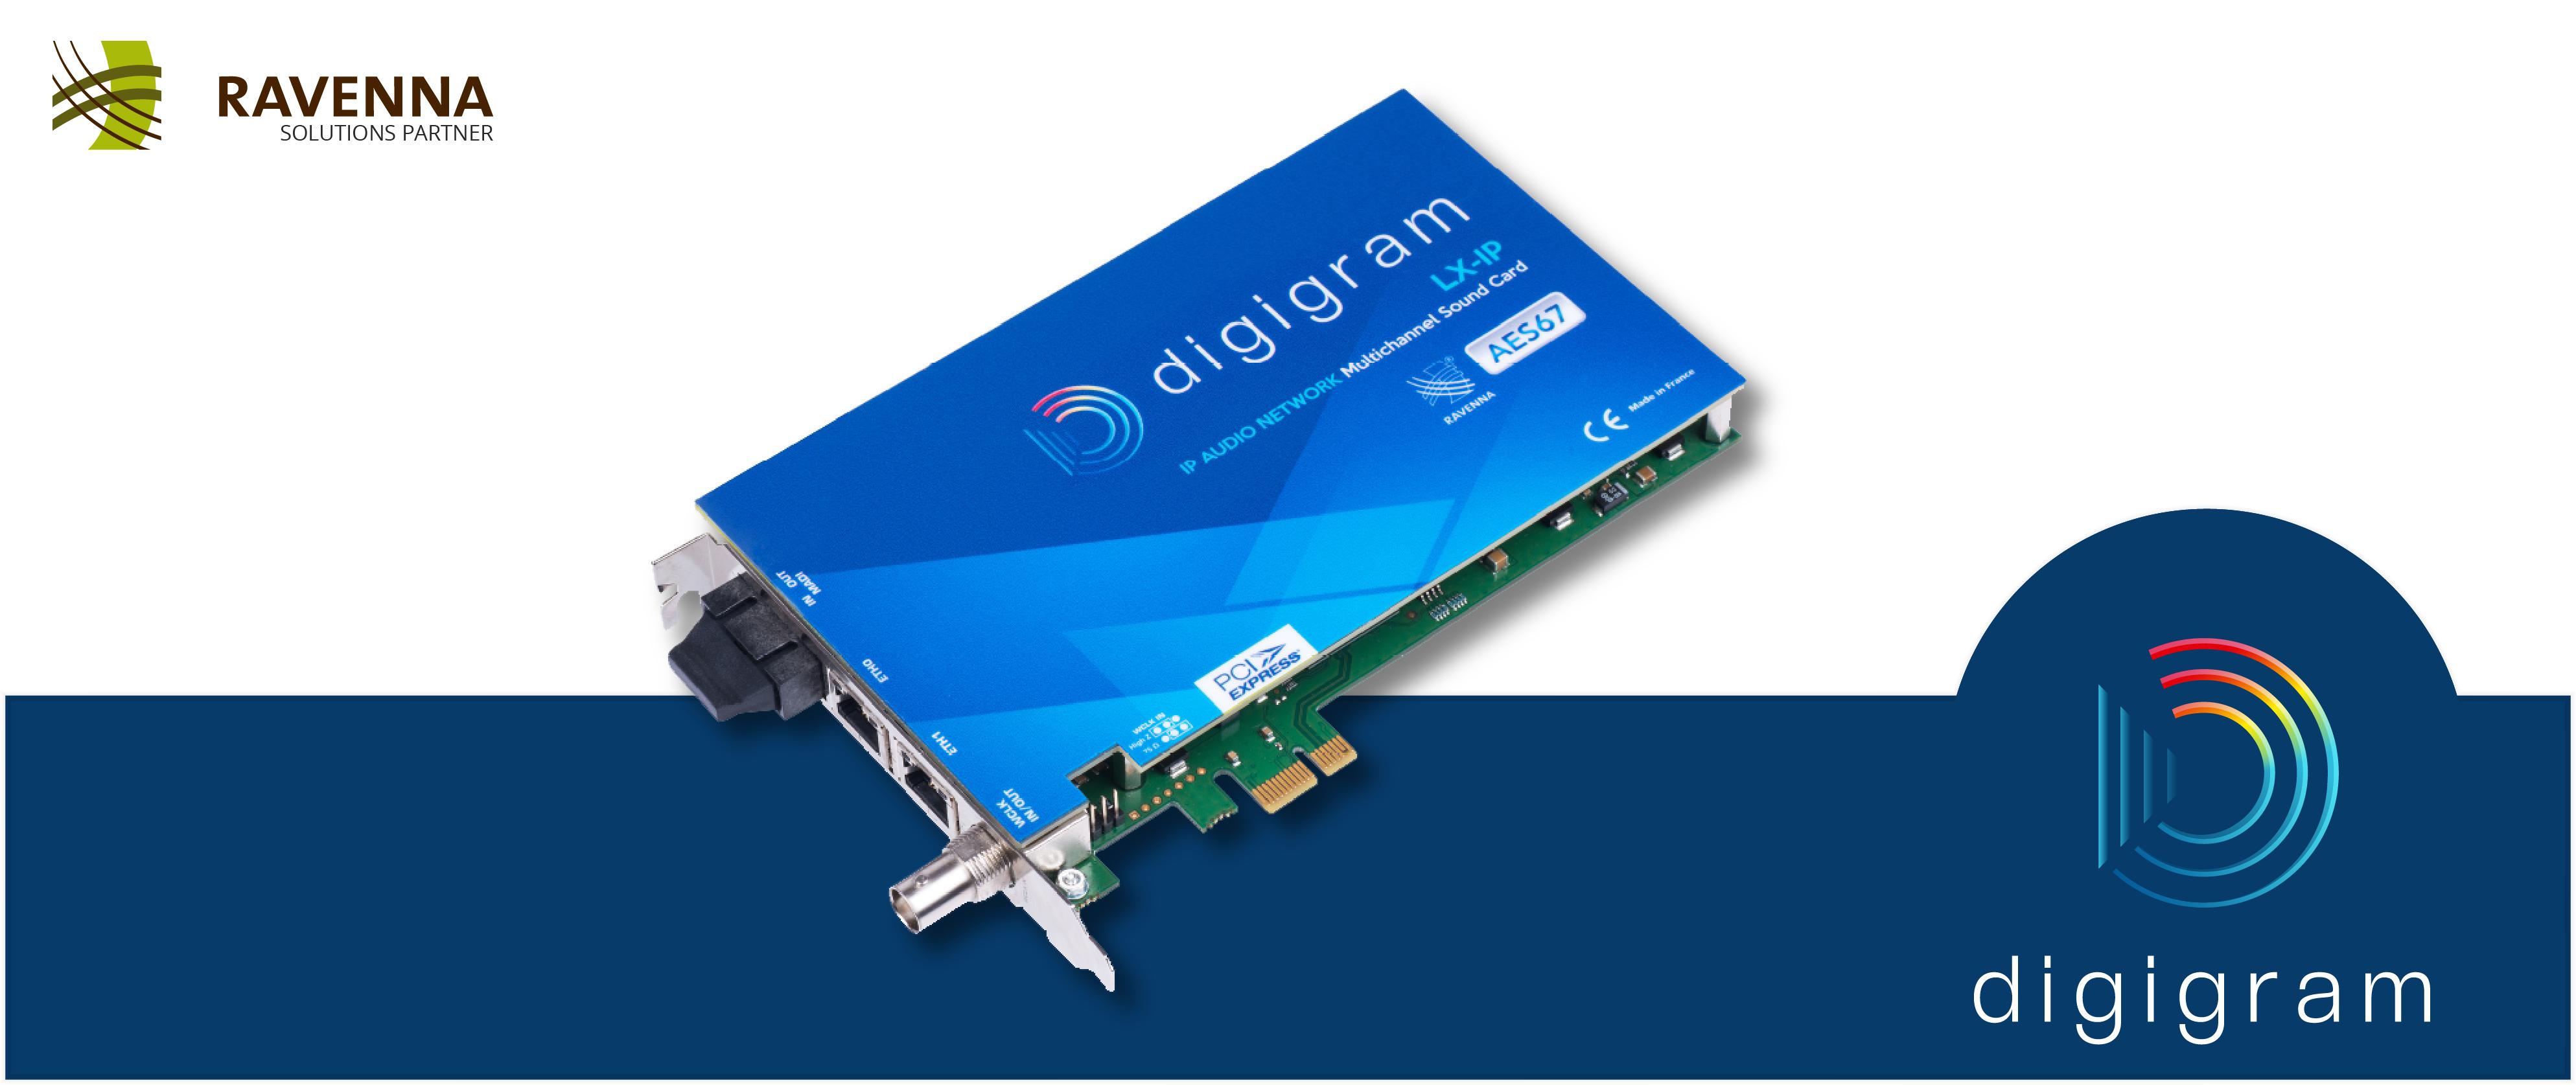 Digigram RAVENNA Solutions